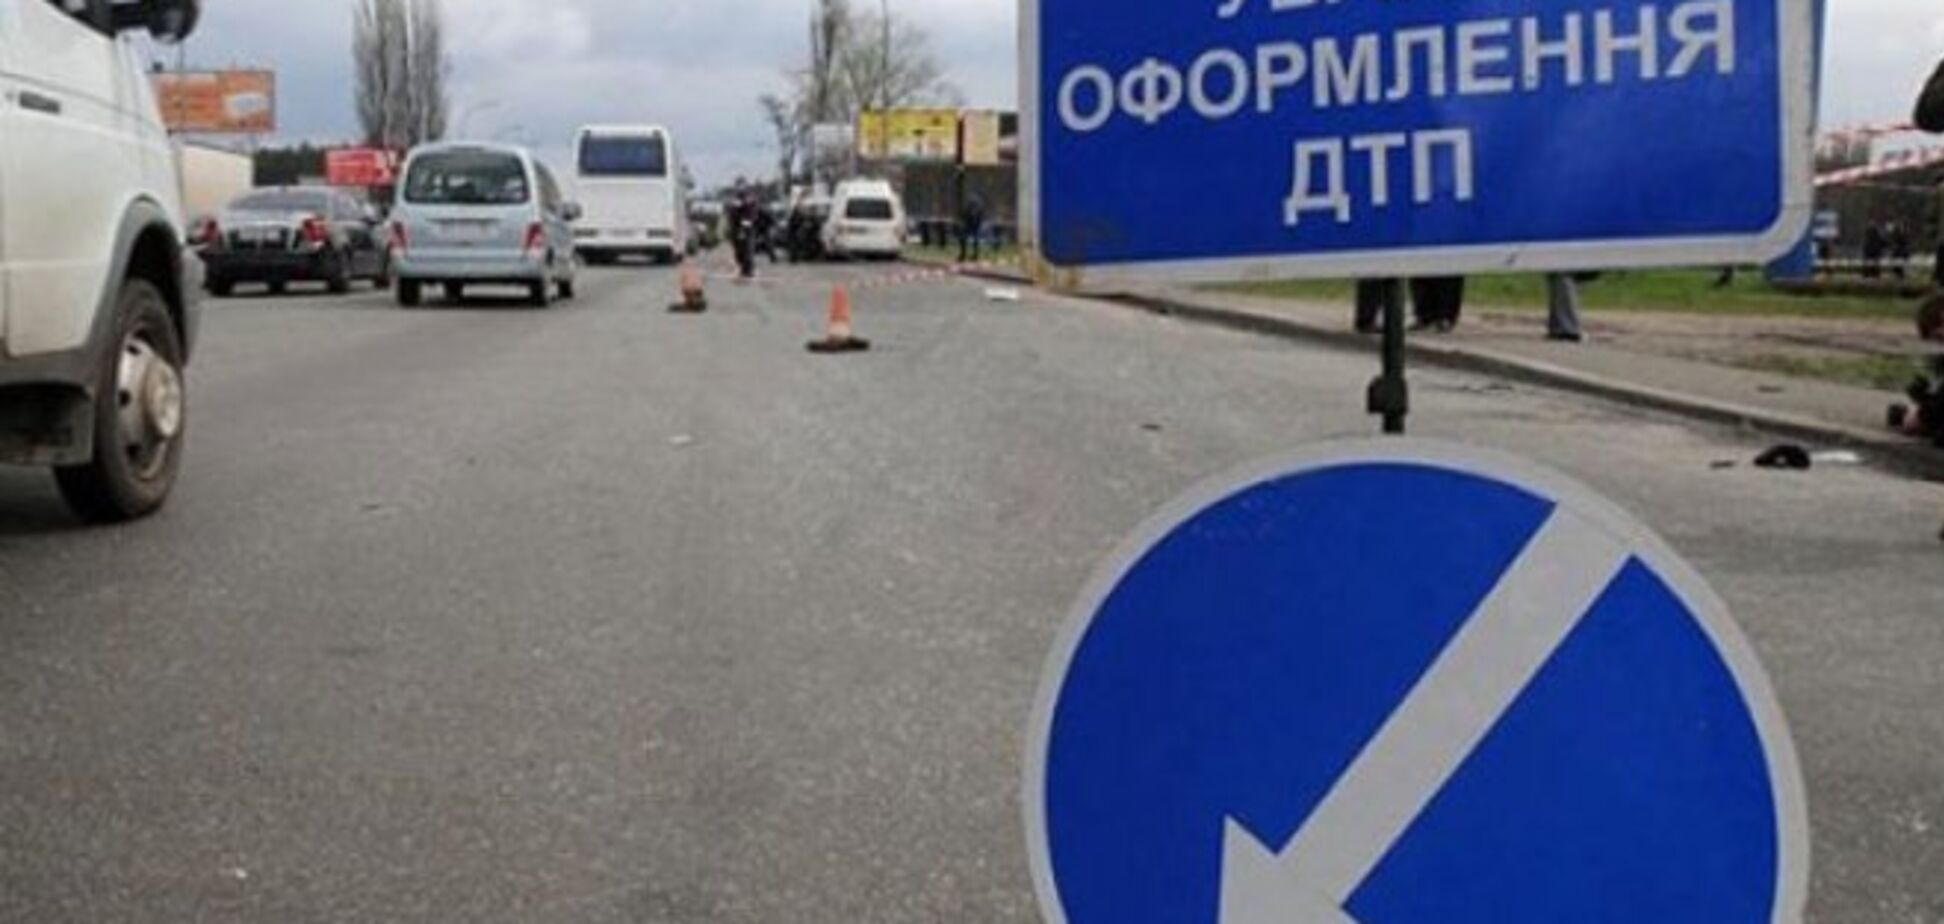 ДТП на Киевщине: маршрутка вылетела на тротуар, 10 пострадавших